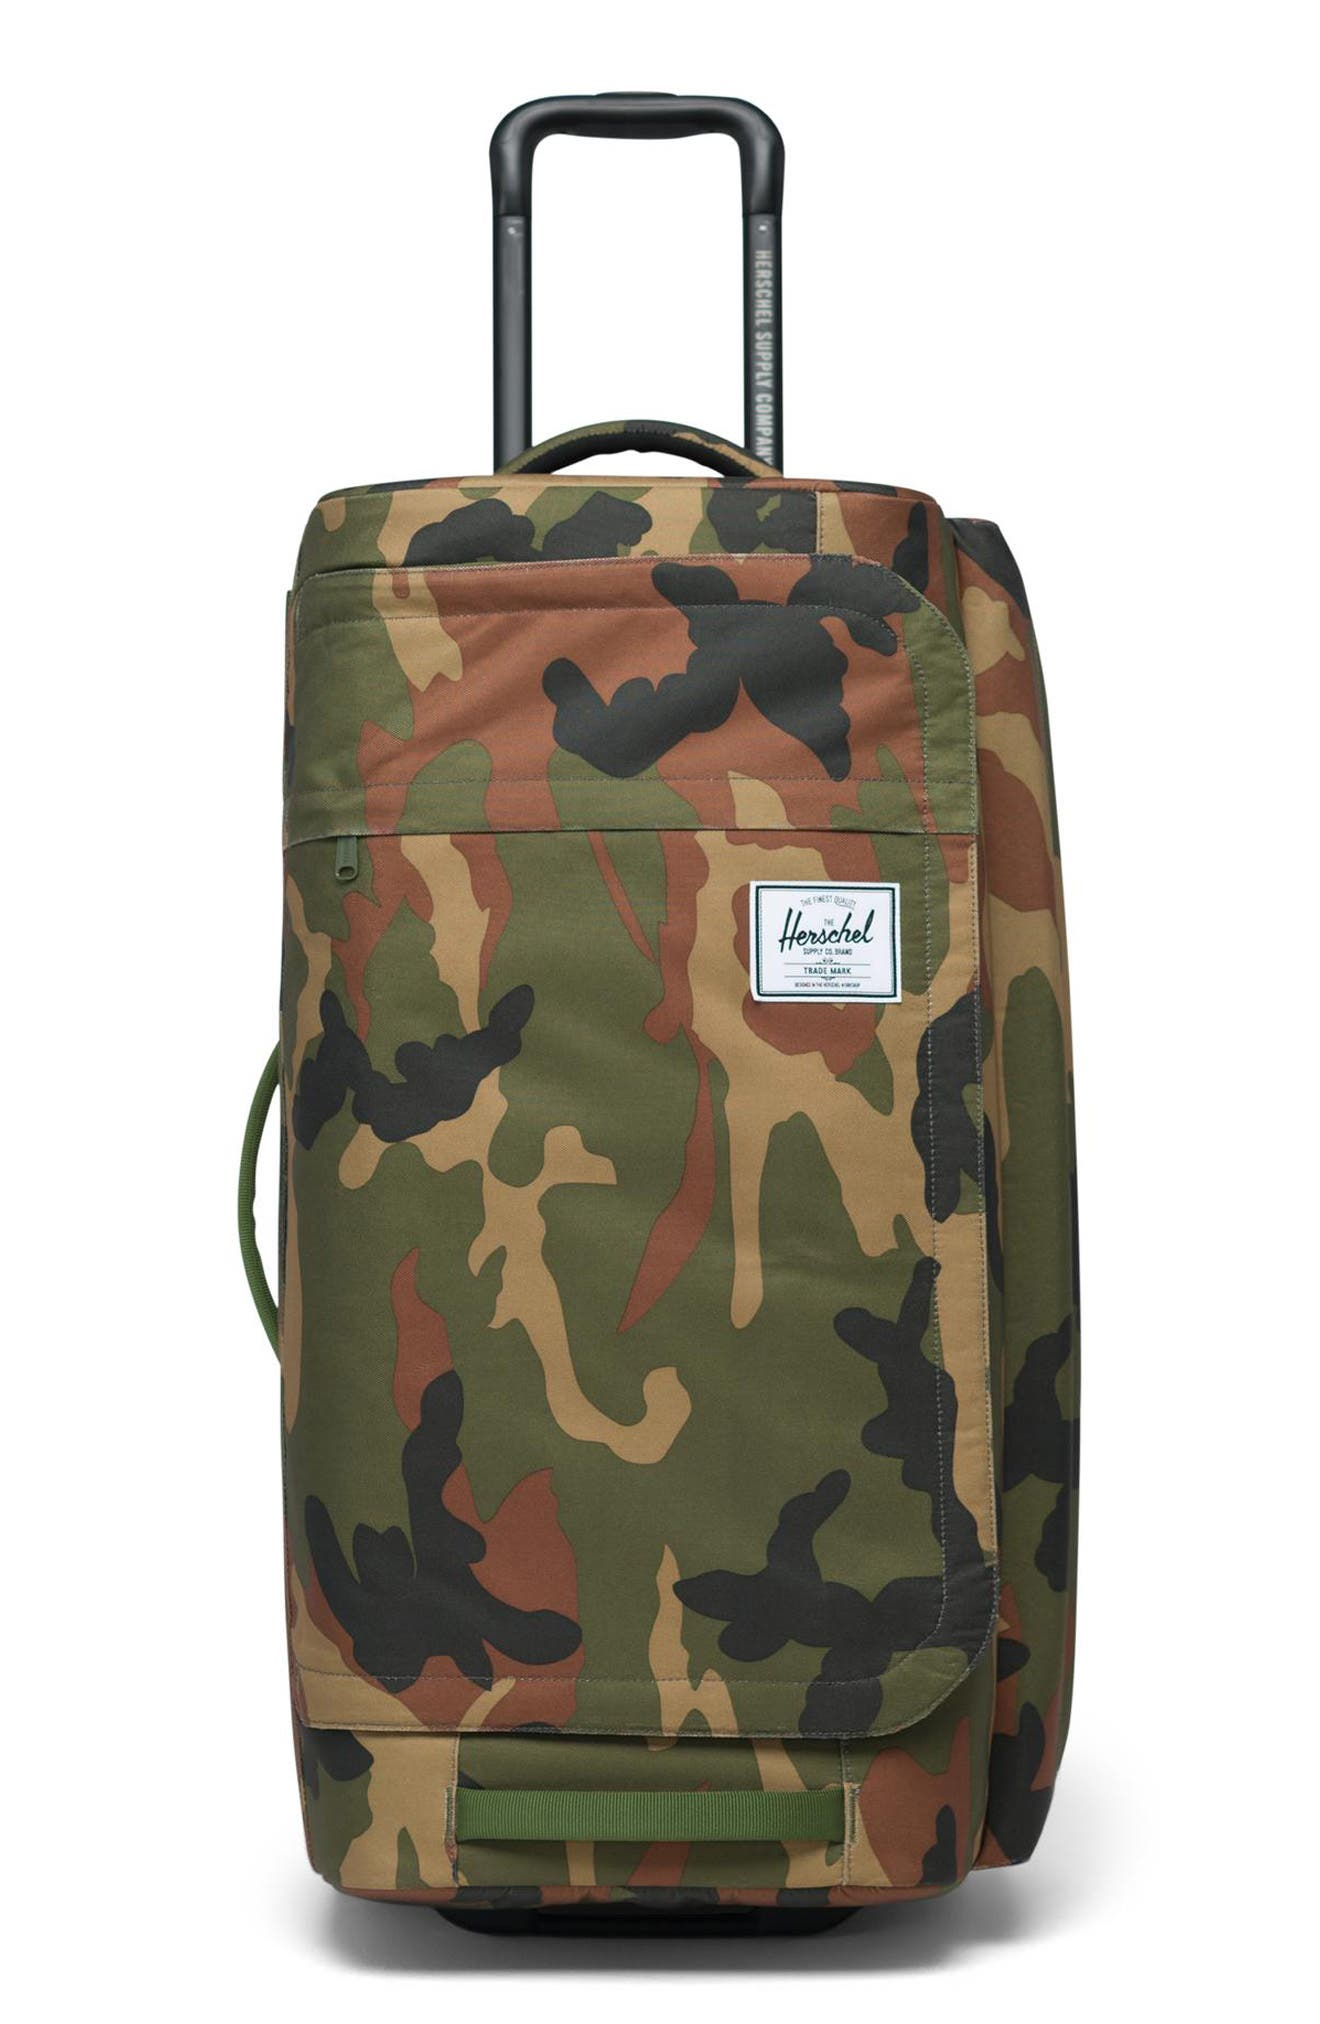 d9dfd2b9ac0 Herschel Supply Co. Women s Luggage Backpacks   Bags   Nordstrom